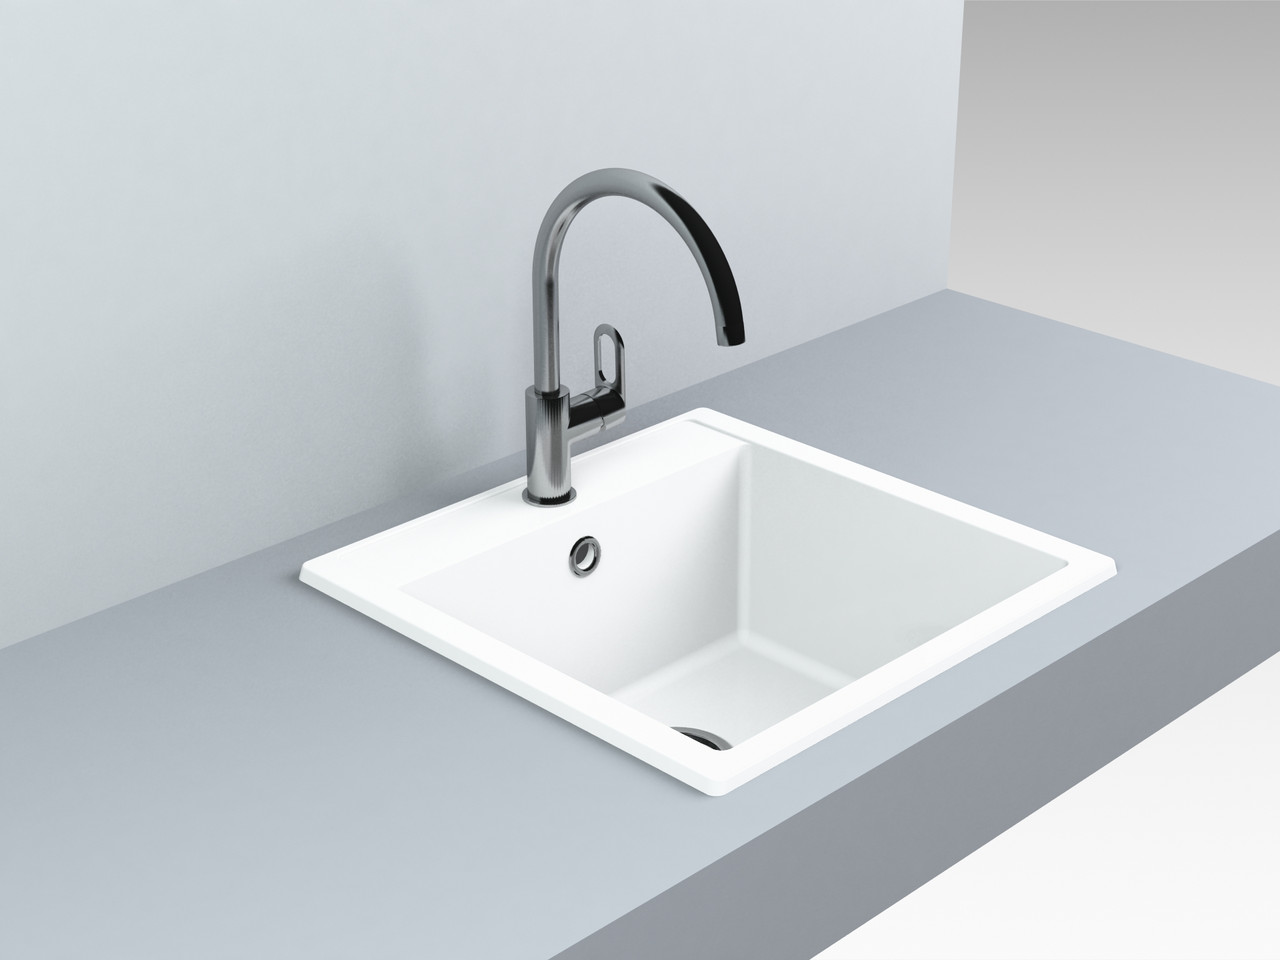 Кварцевая мойка для кухни 509*495*227 мм Miraggio Bodrum 510 белый матовый